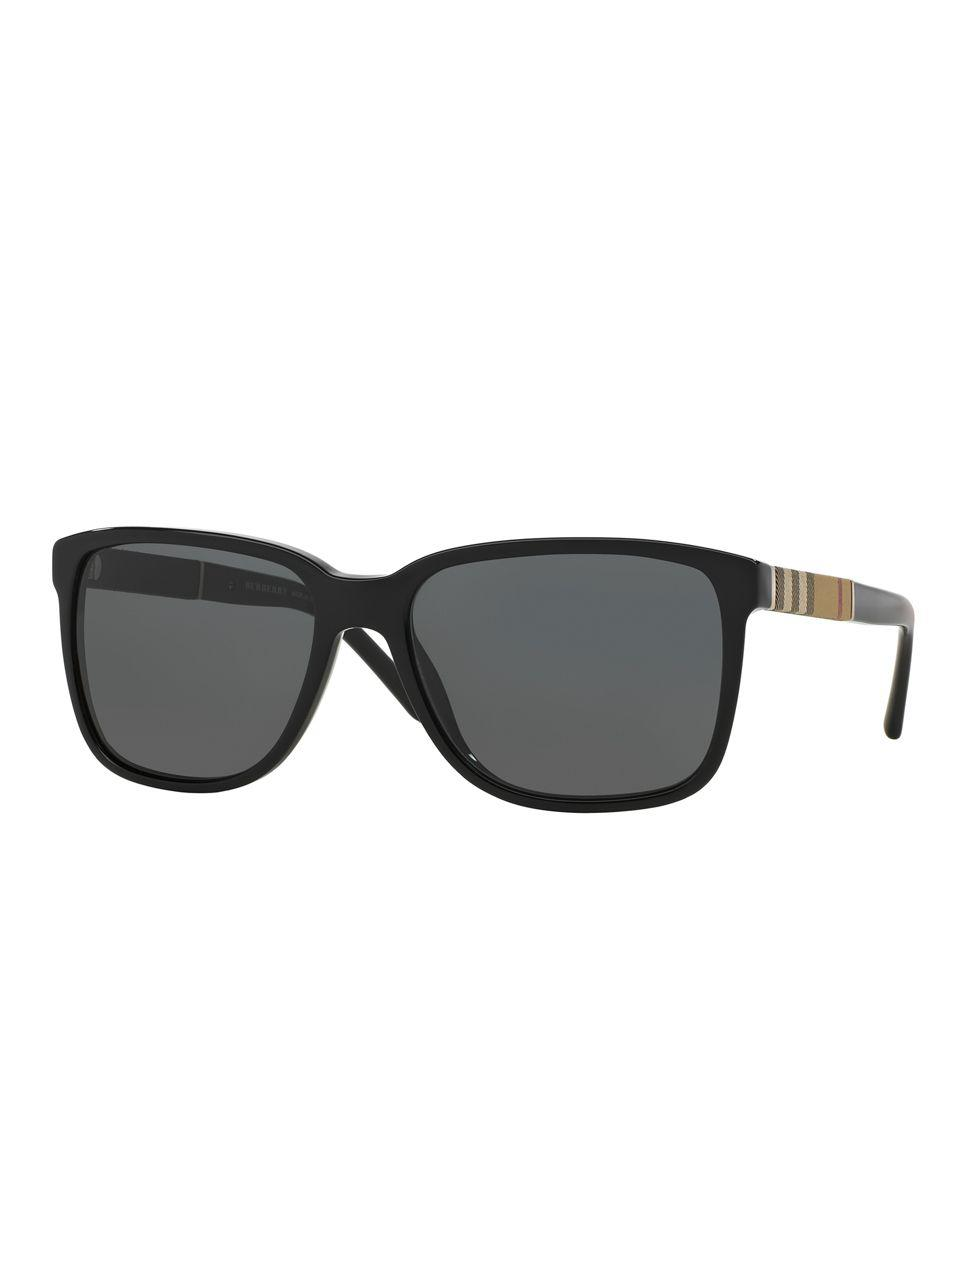 5b7aed15fbdd Burberry 58mm Check-print Wayfarer Sunglasses in Black for Men - Lyst